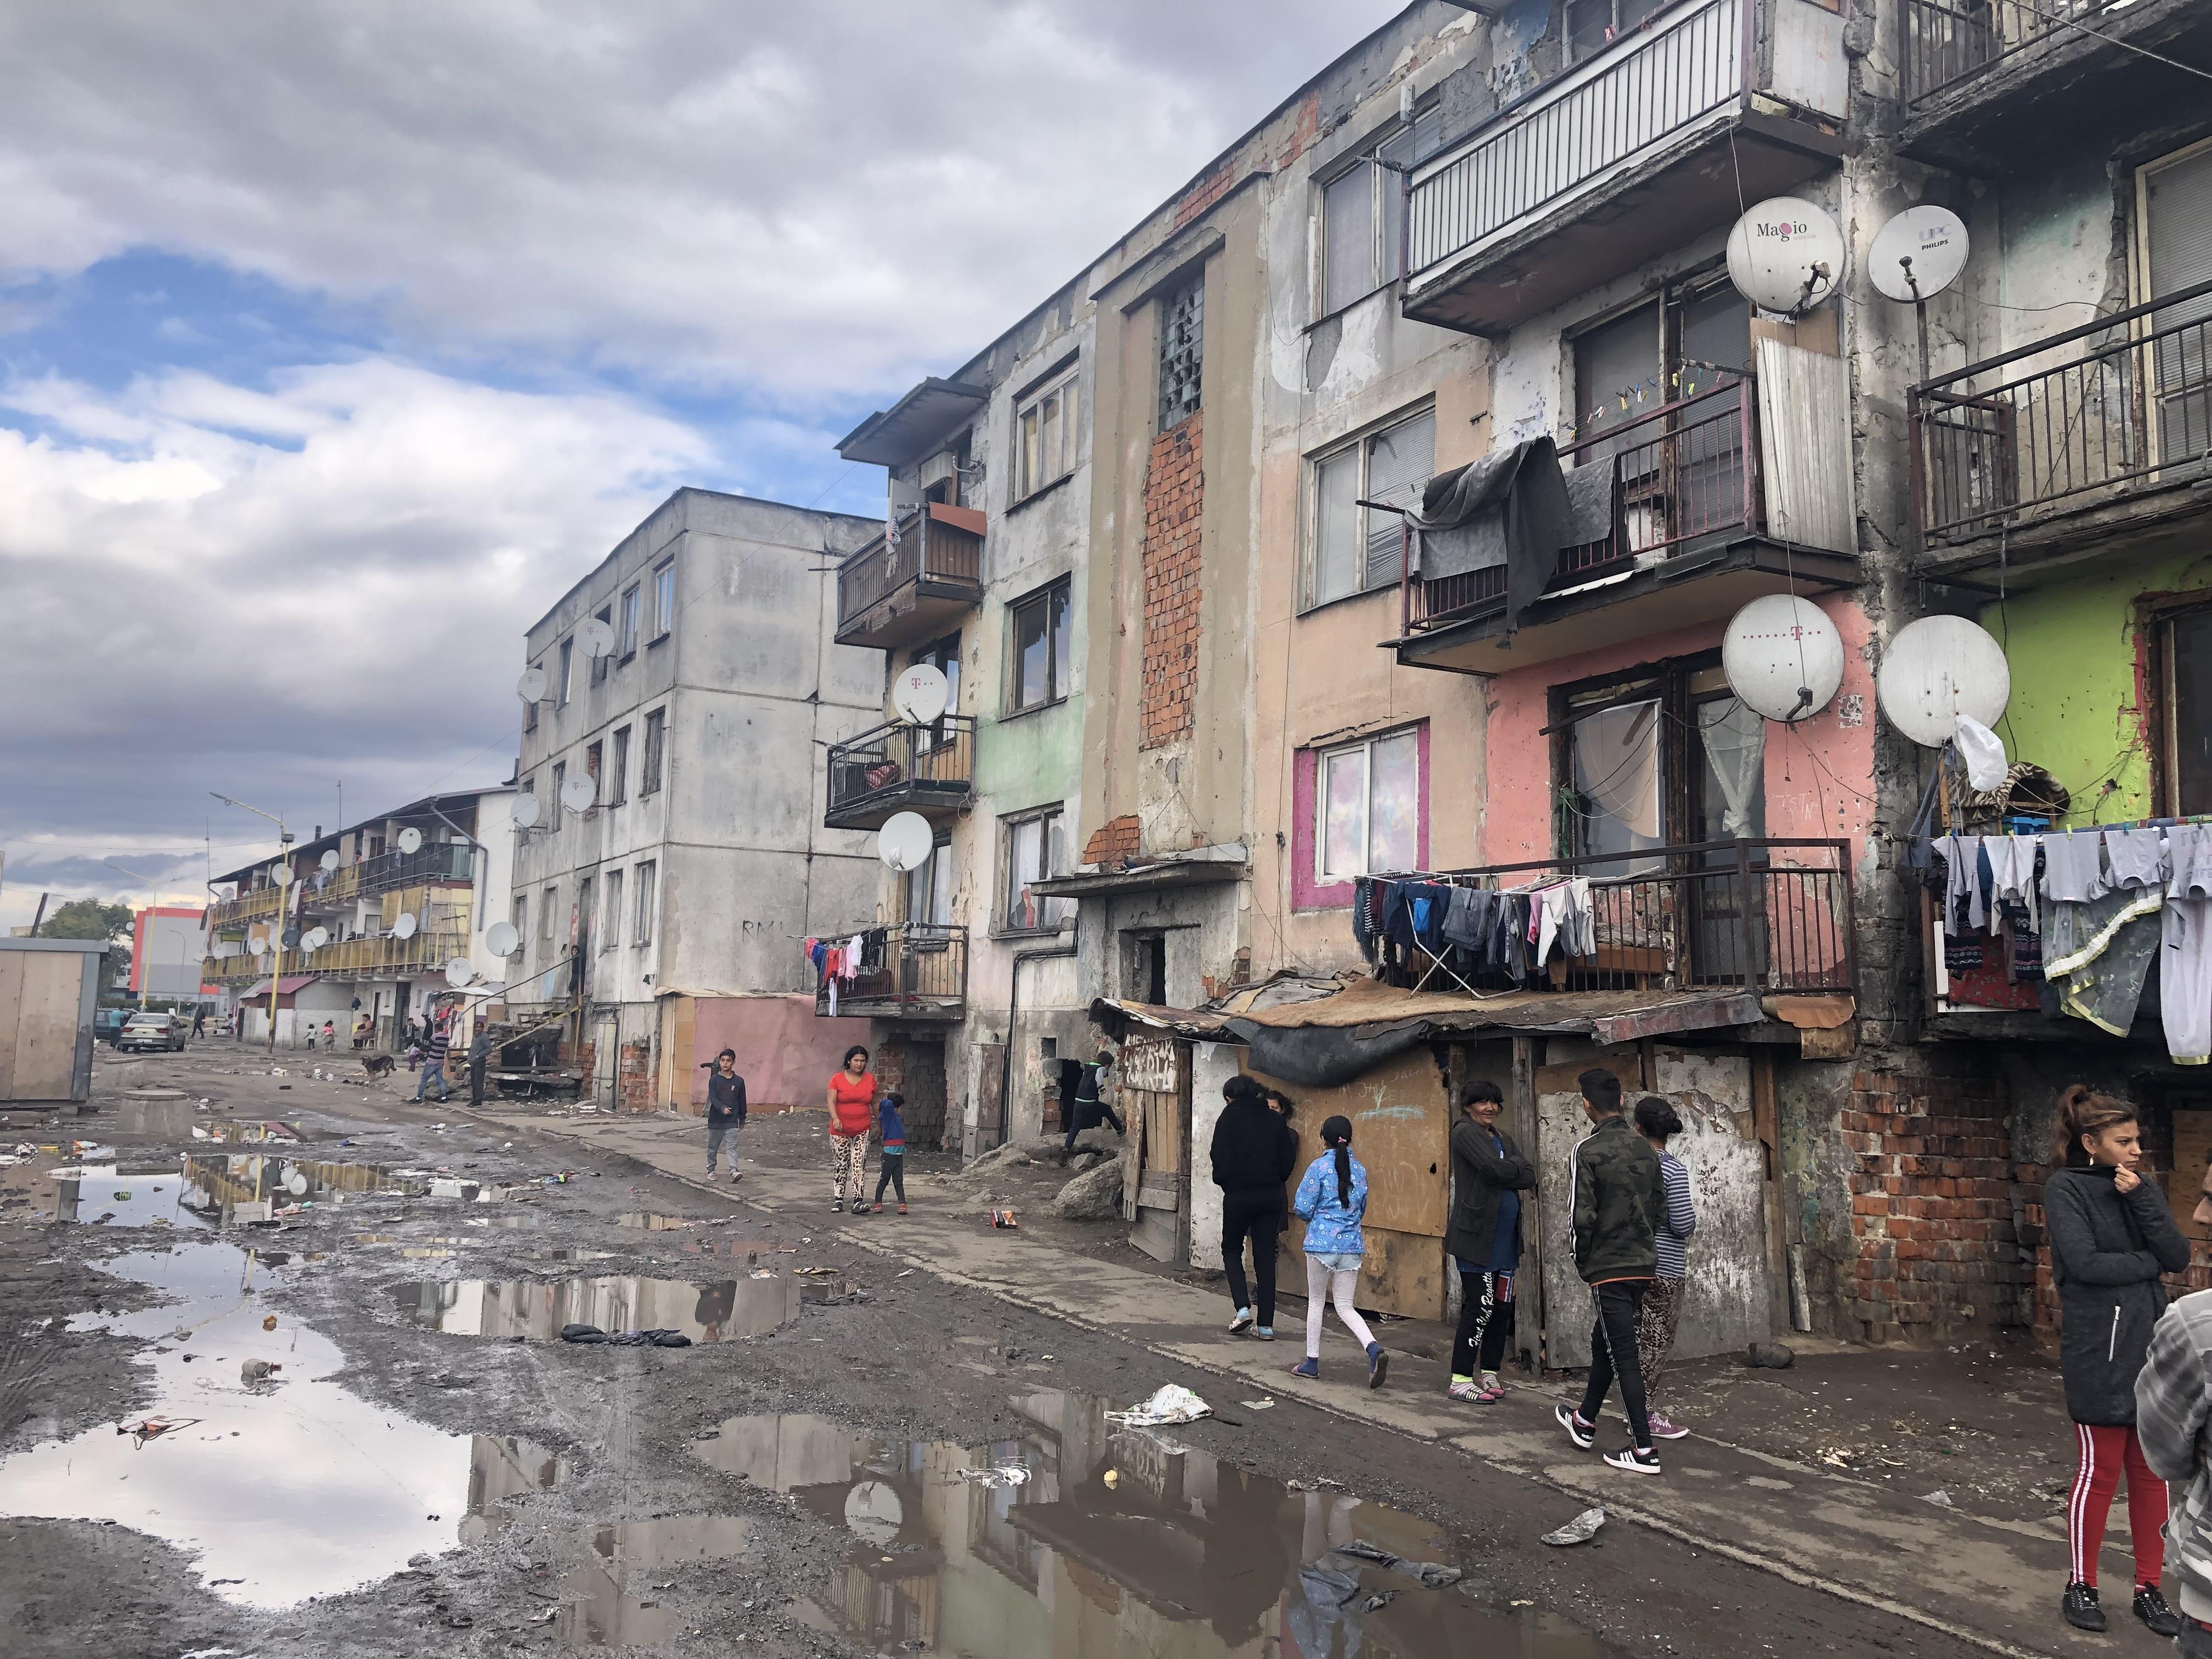 Trebisov, Slovakia, where the victim lived